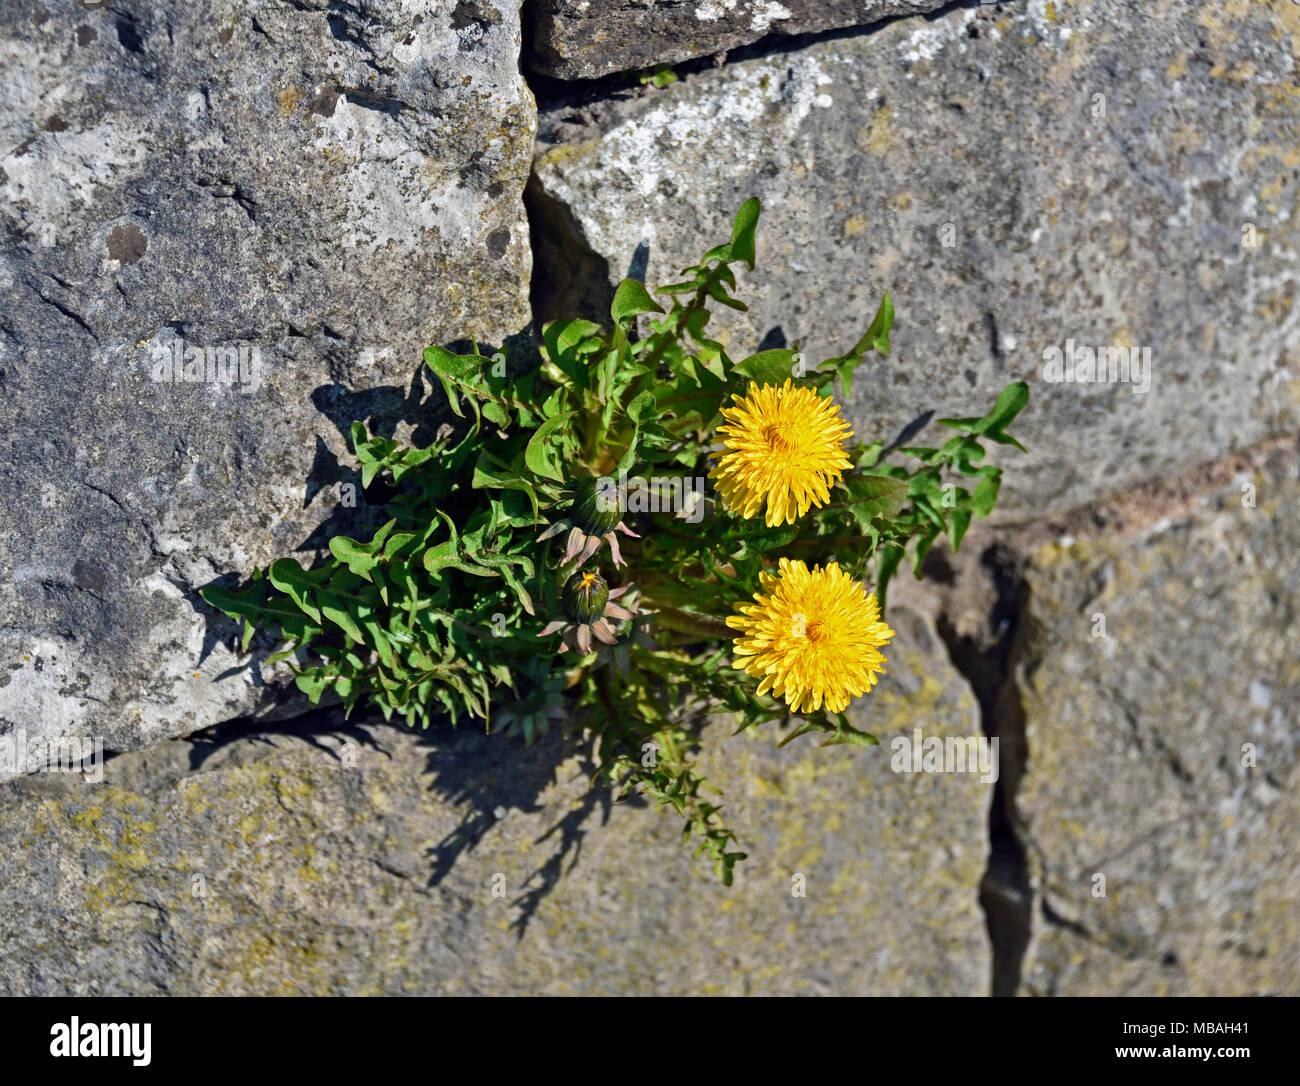 Dandelion (Taraxacum) growing in a limestone wall. Parkside Road, Kendal, Cumbria, England, United Kingdom, Europe. - Stock Image